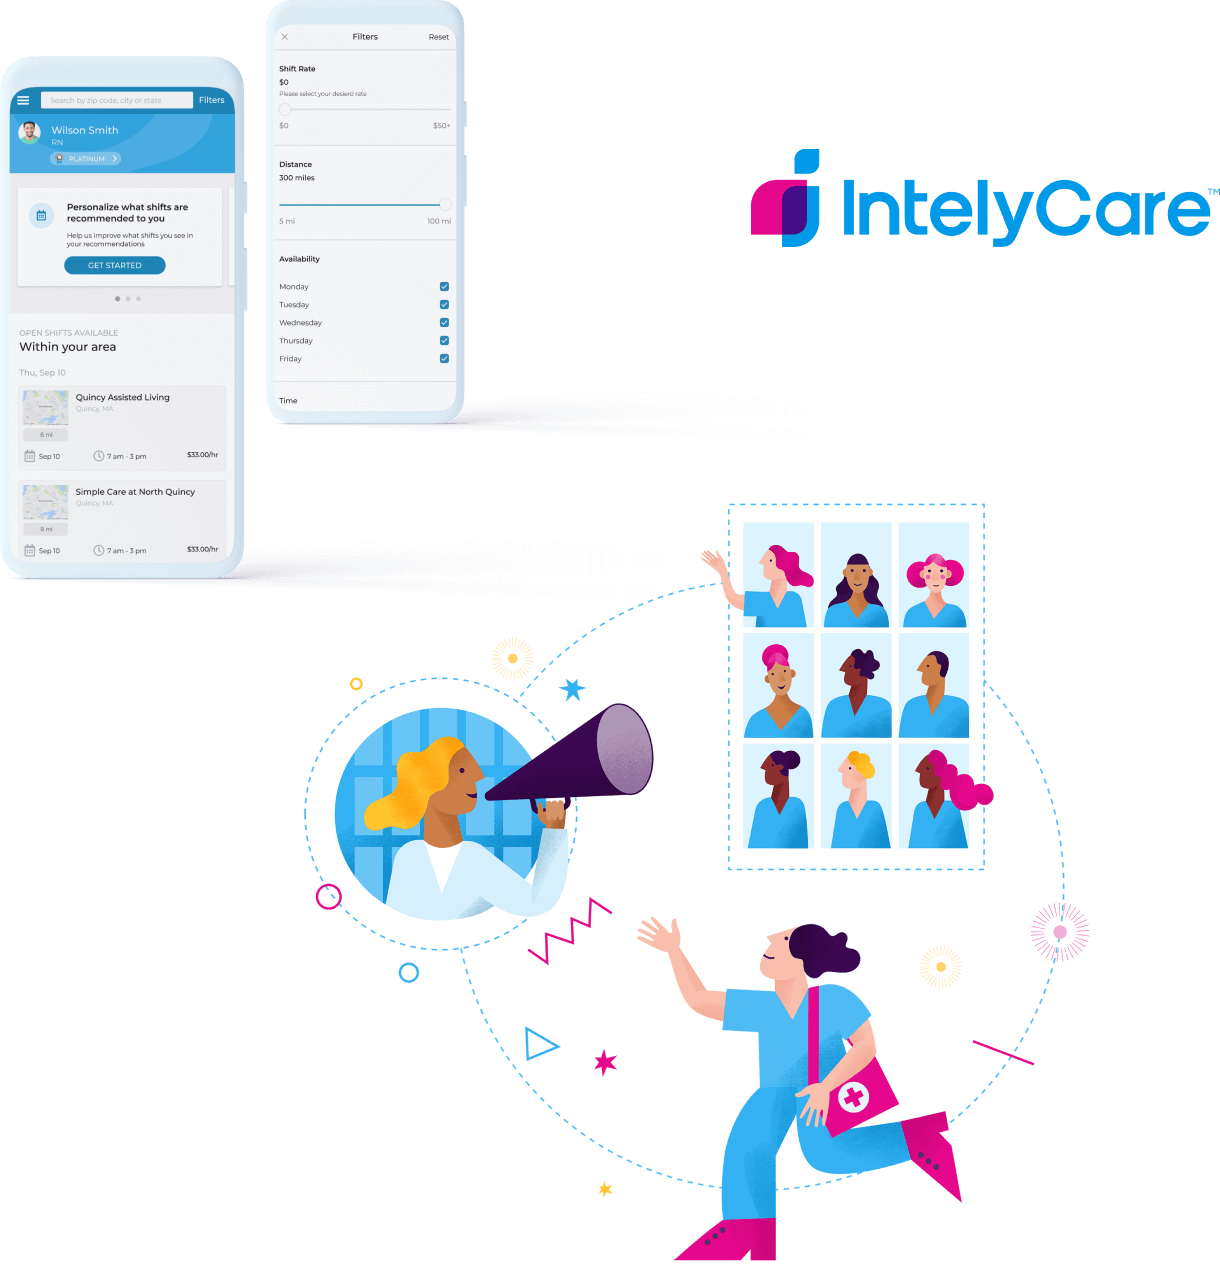 IntelyCare - Branding Collage